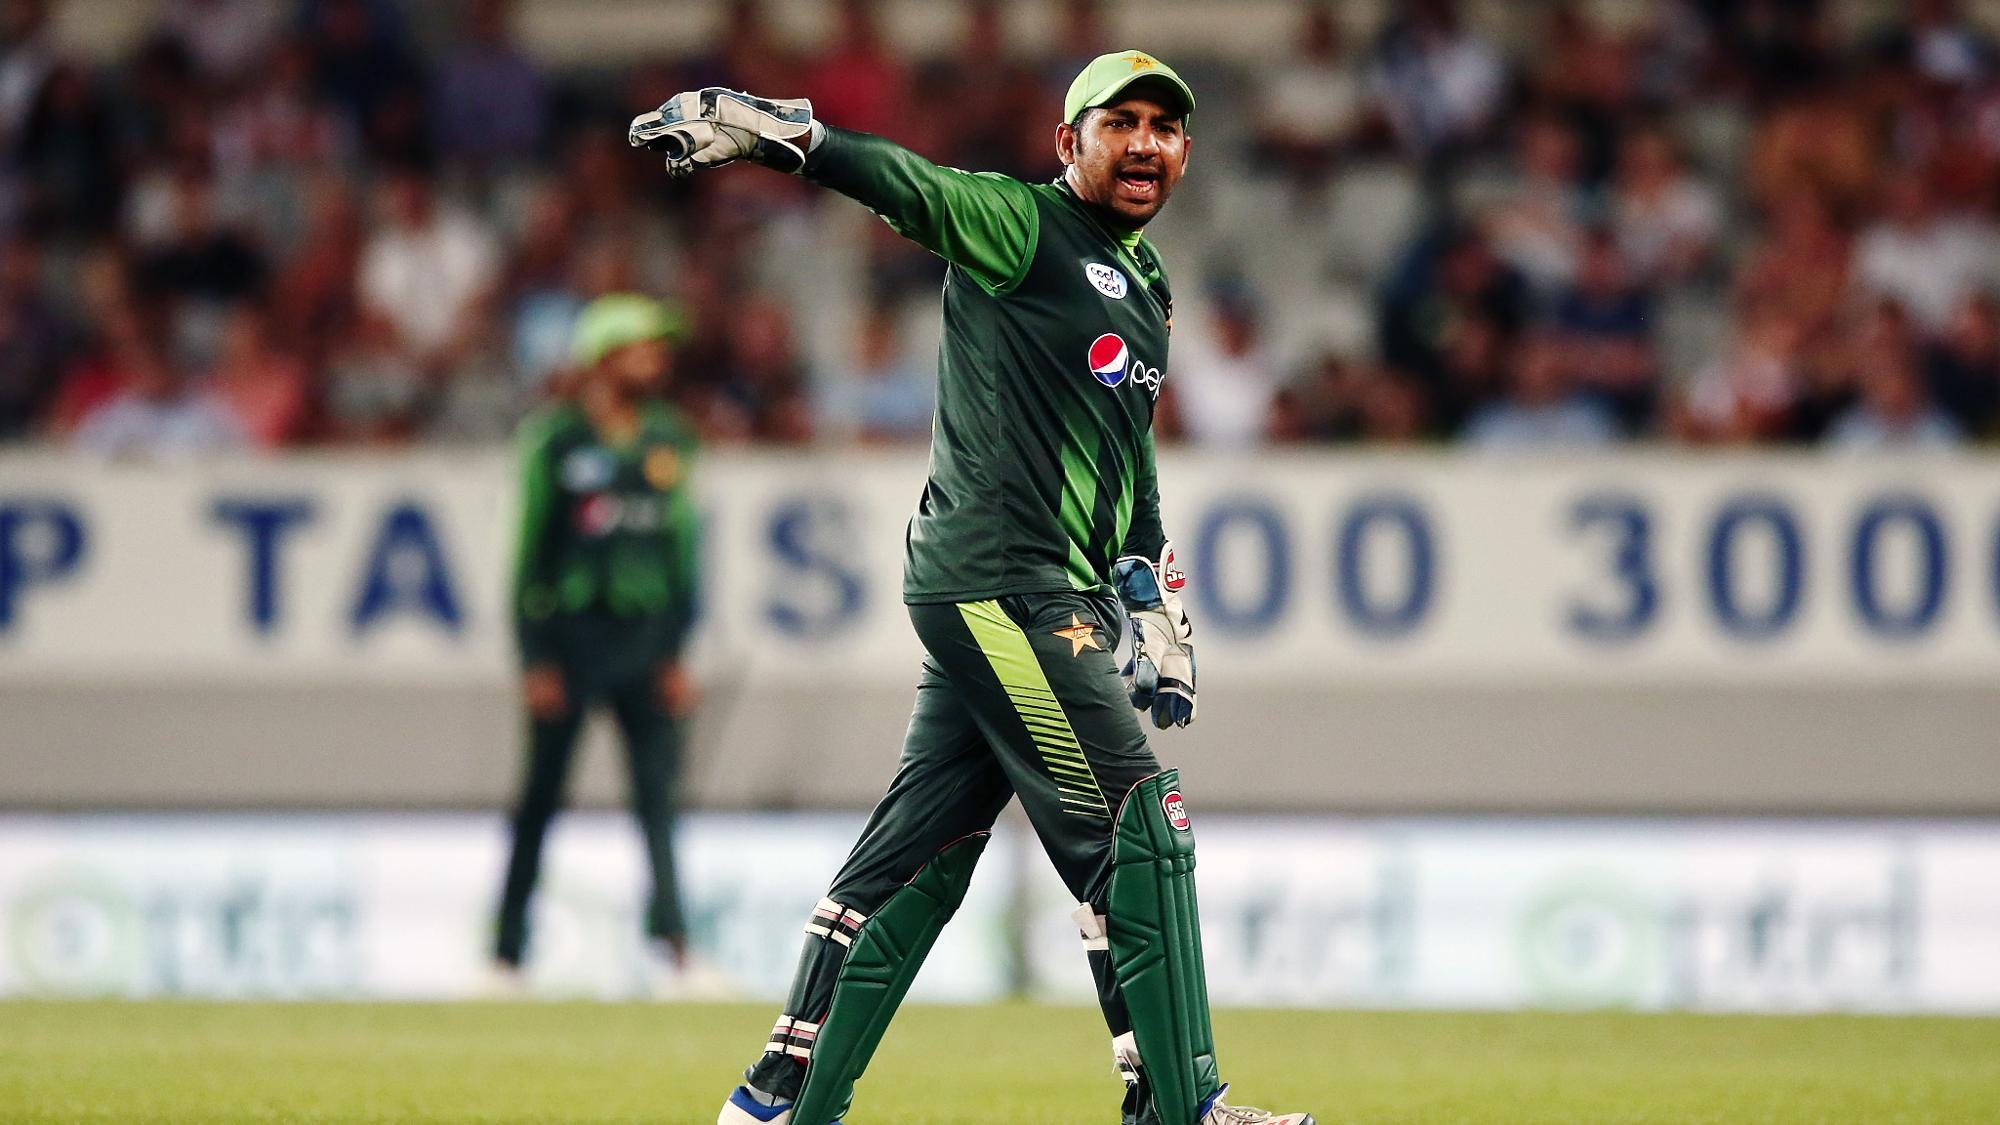 Sarfaraz to lead Pakistan at 2019 ICC Cricket World Cup